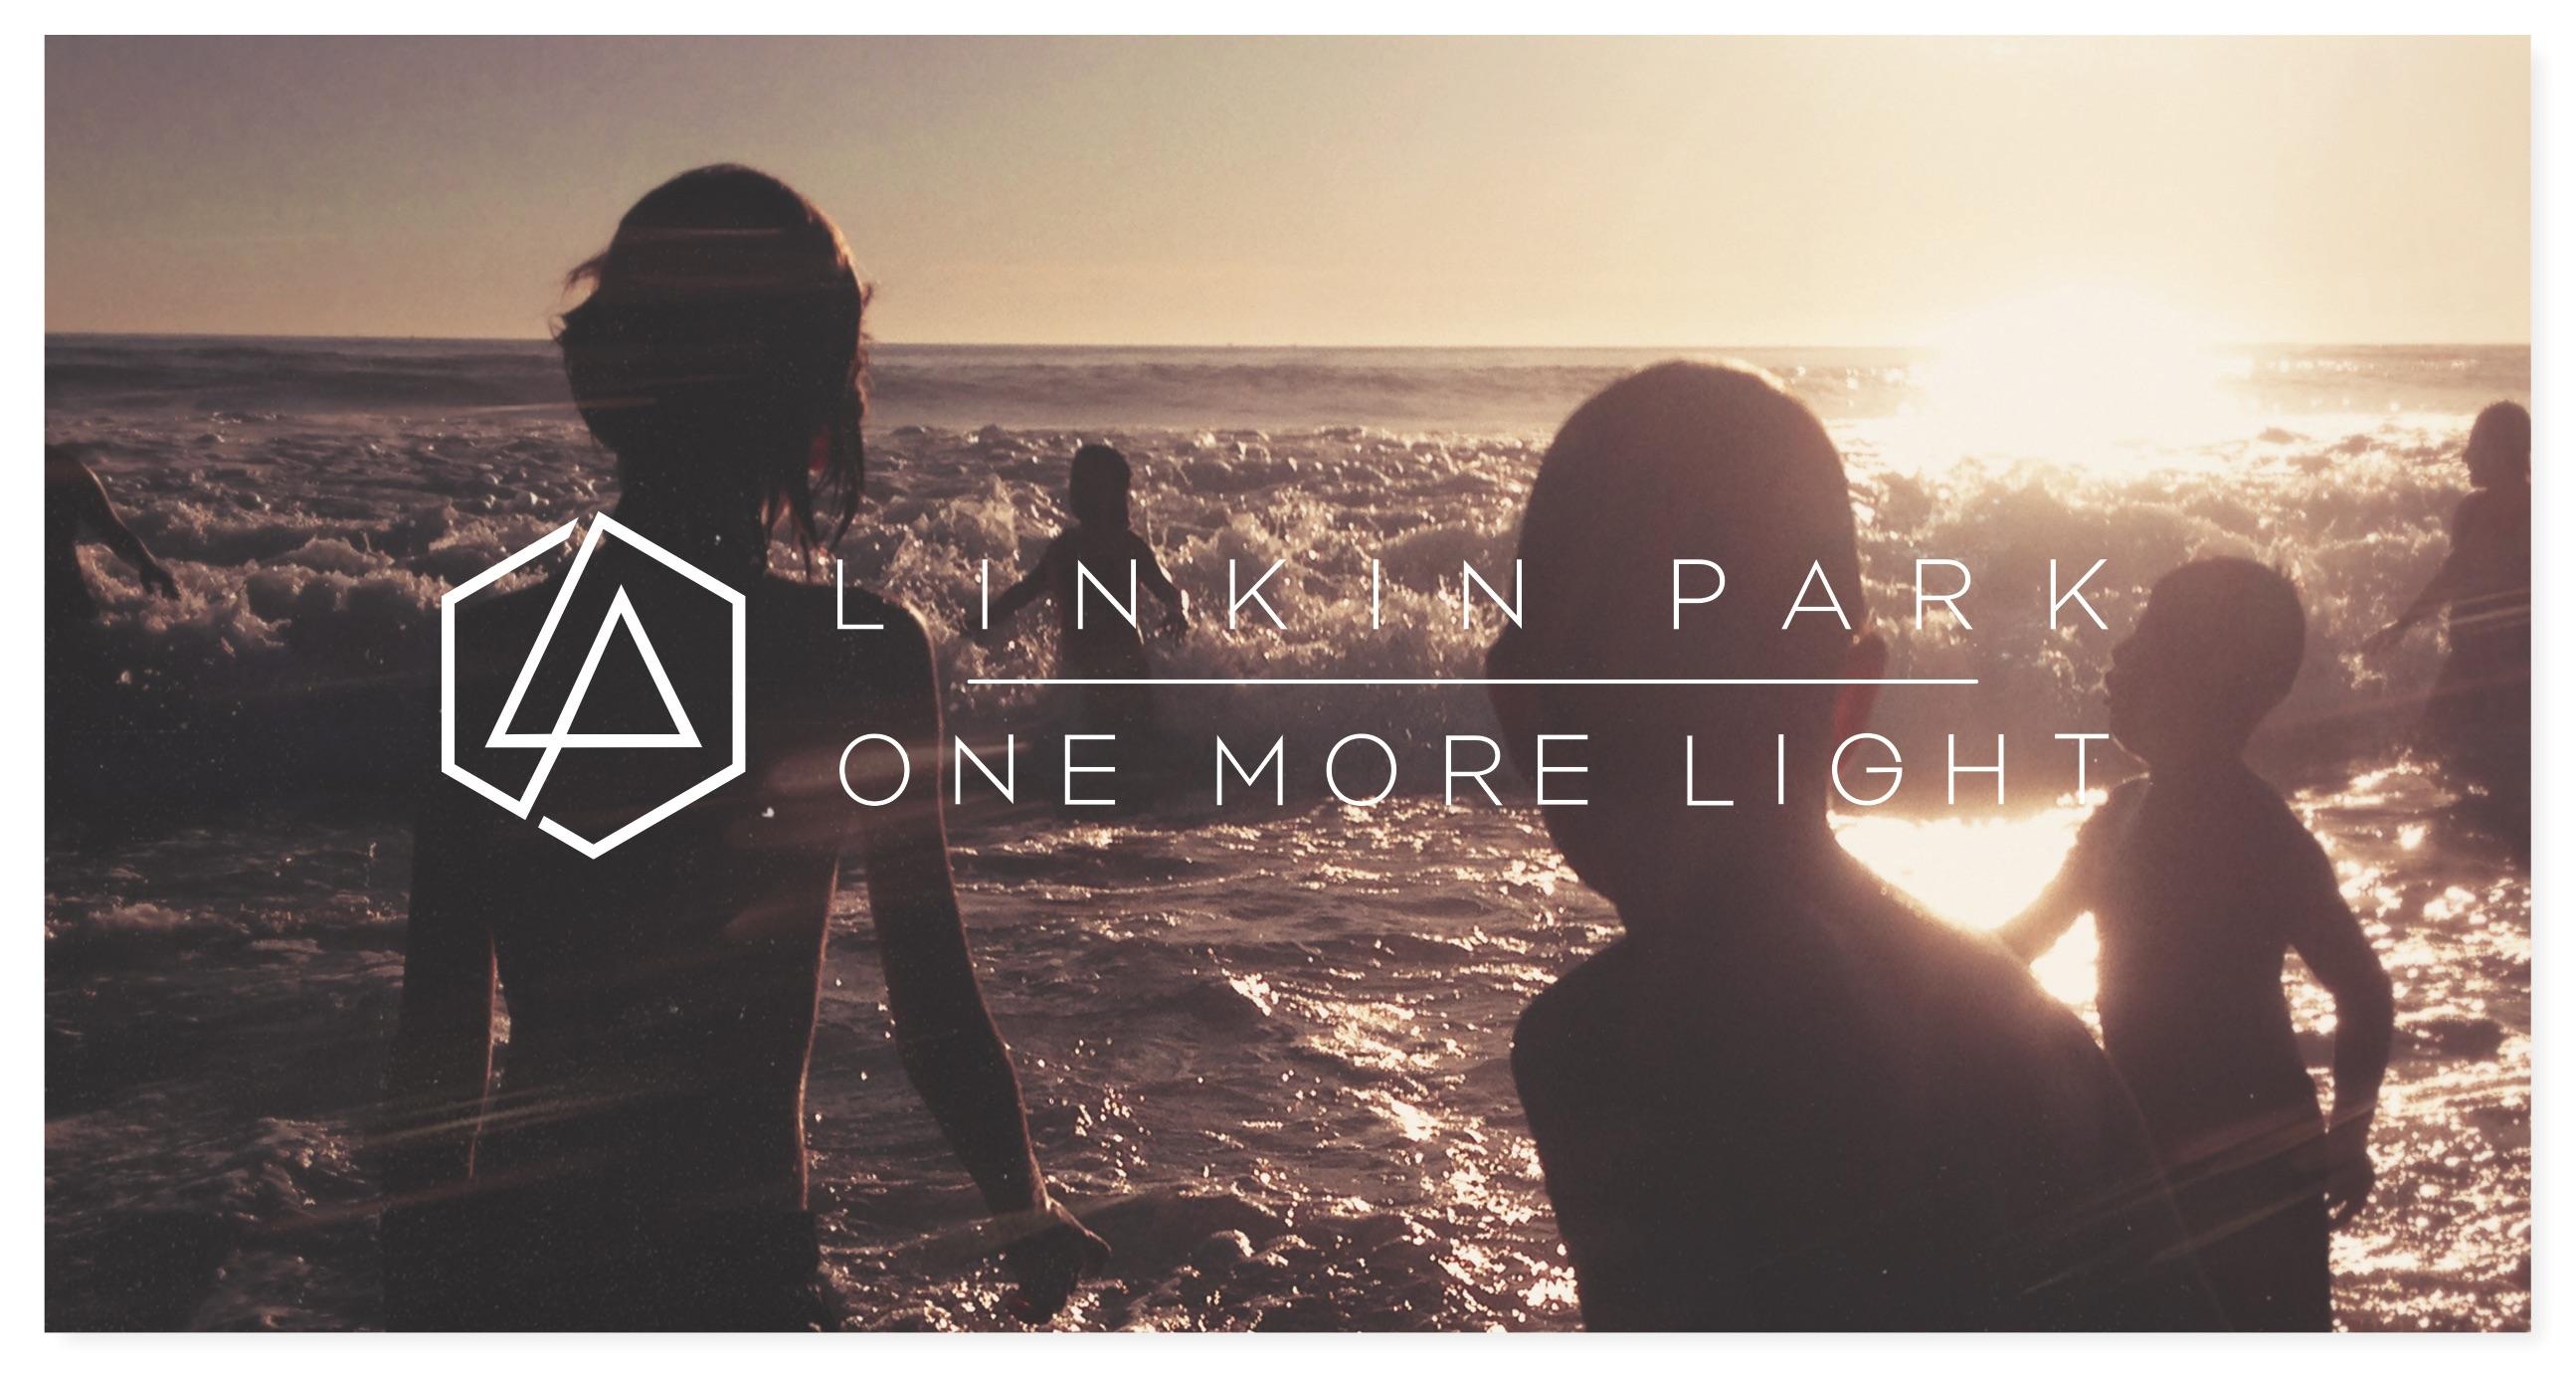 Linkin Park One More Light World Tour Songs